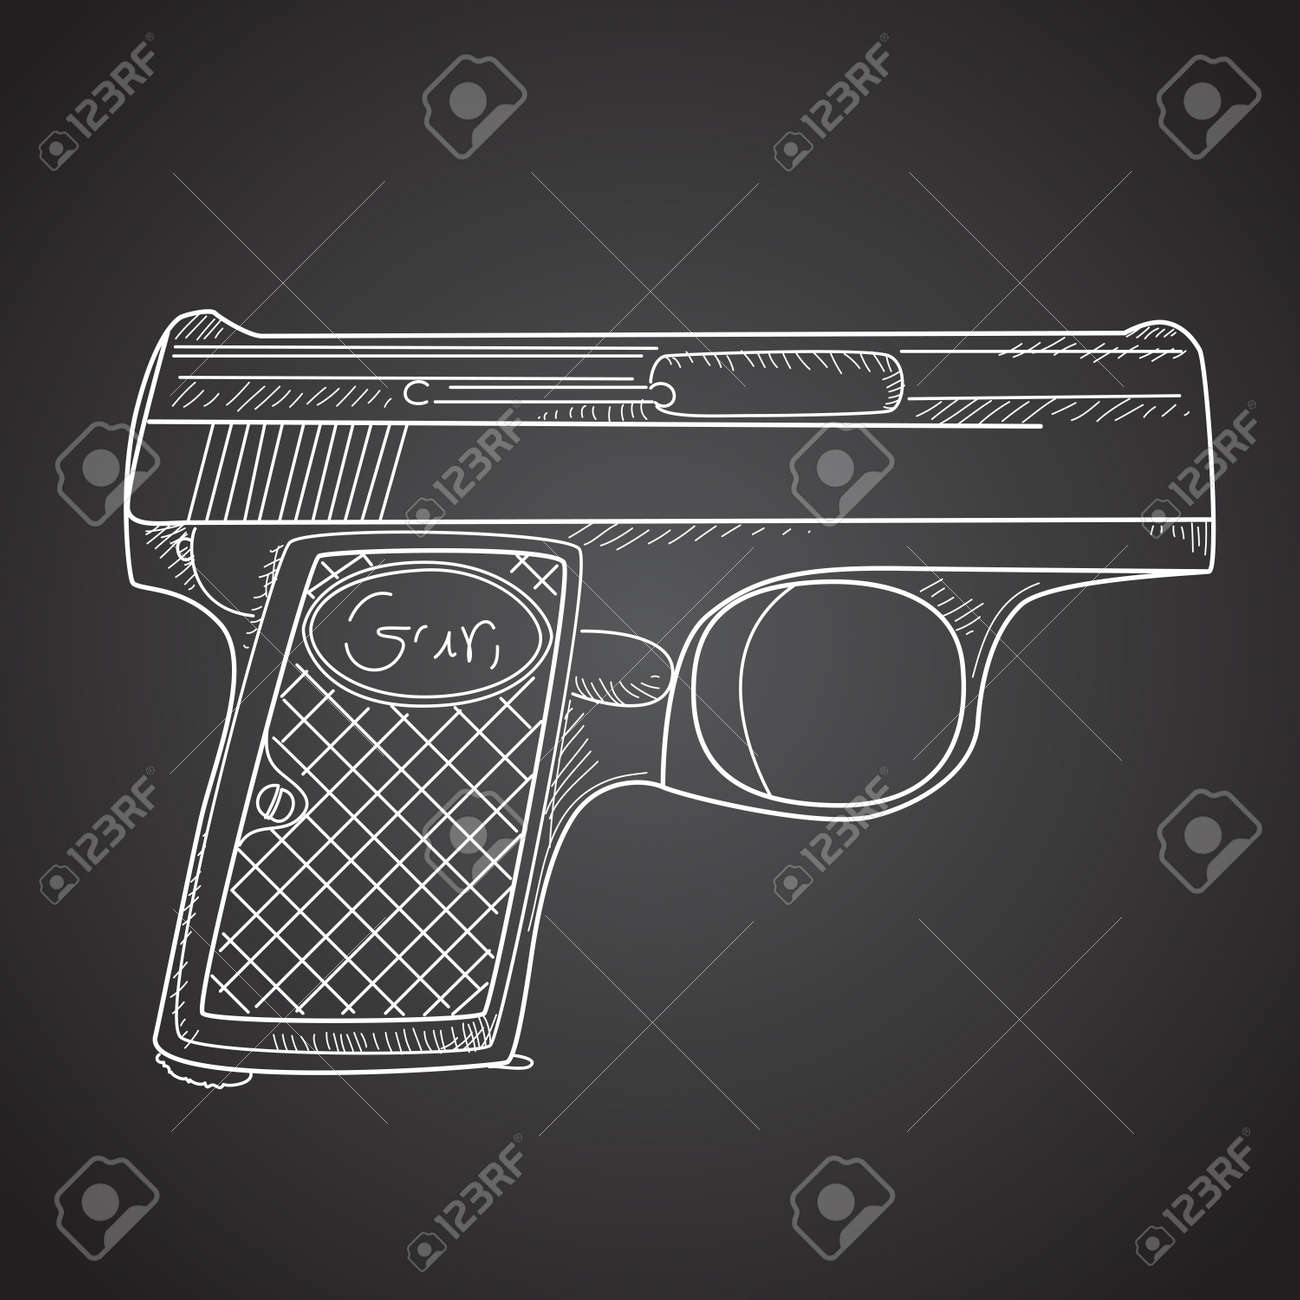 Gun doodle on black background Stock Vector - 15158418